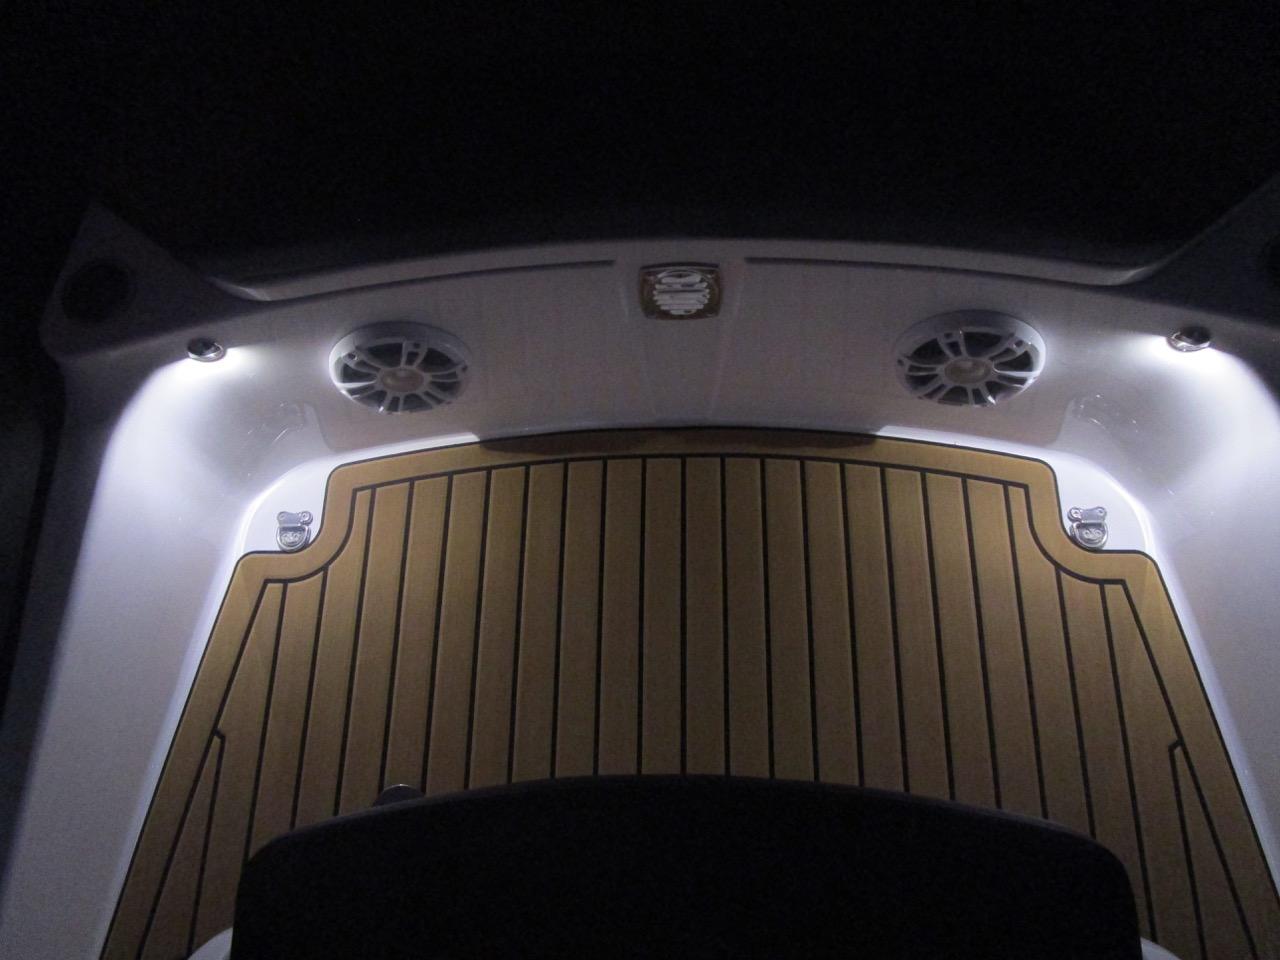 GRAND G850 RIB LED deck lights, bow